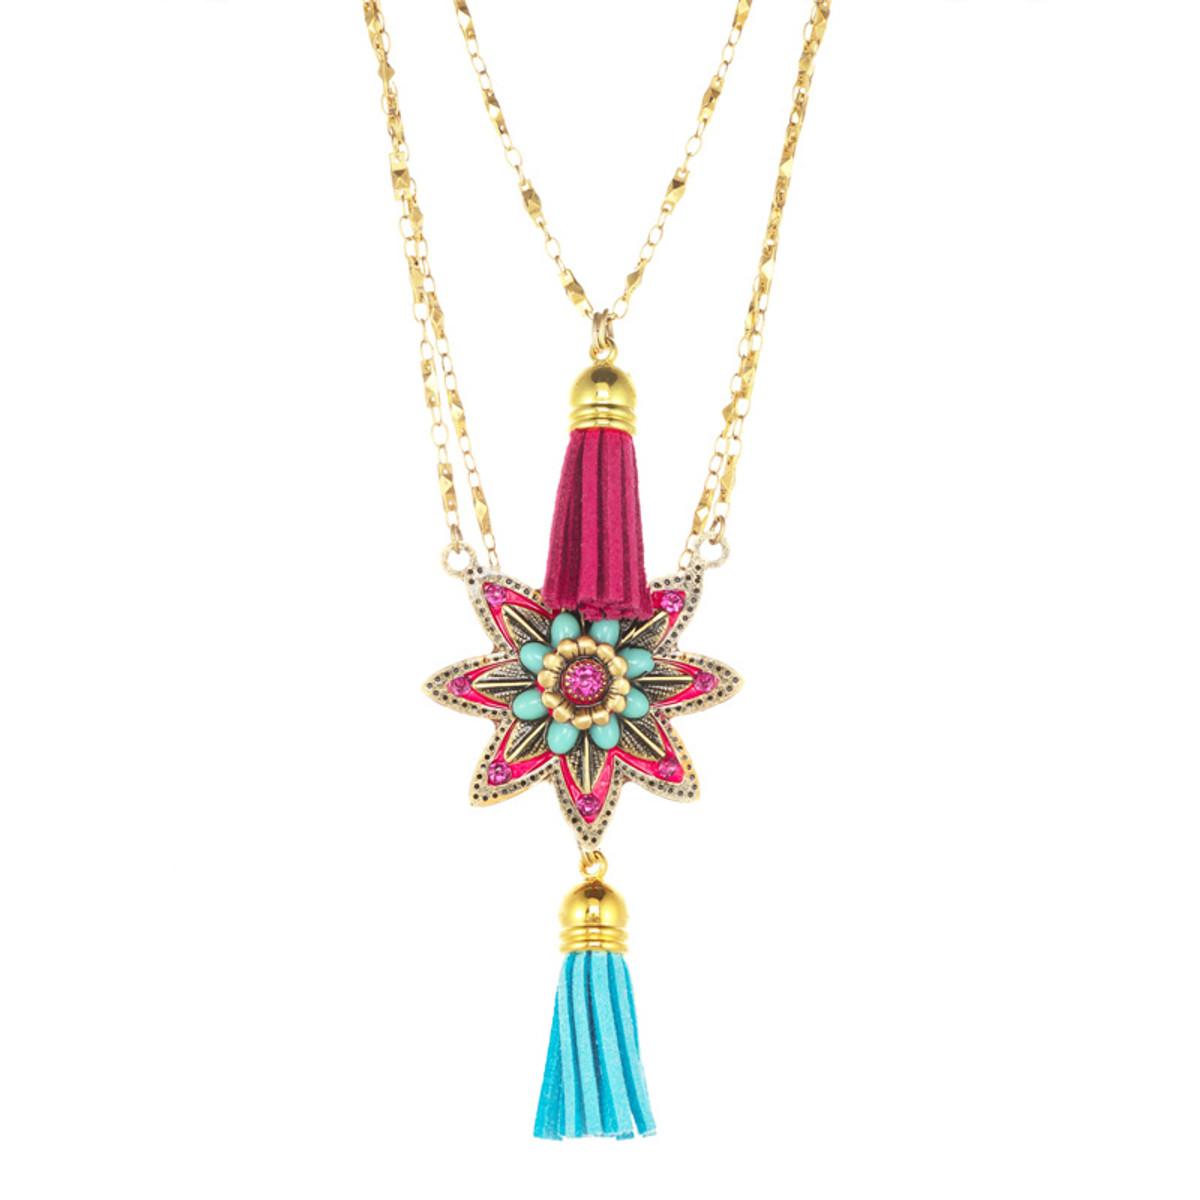 Michal Golan Star Flower Charm Necklace